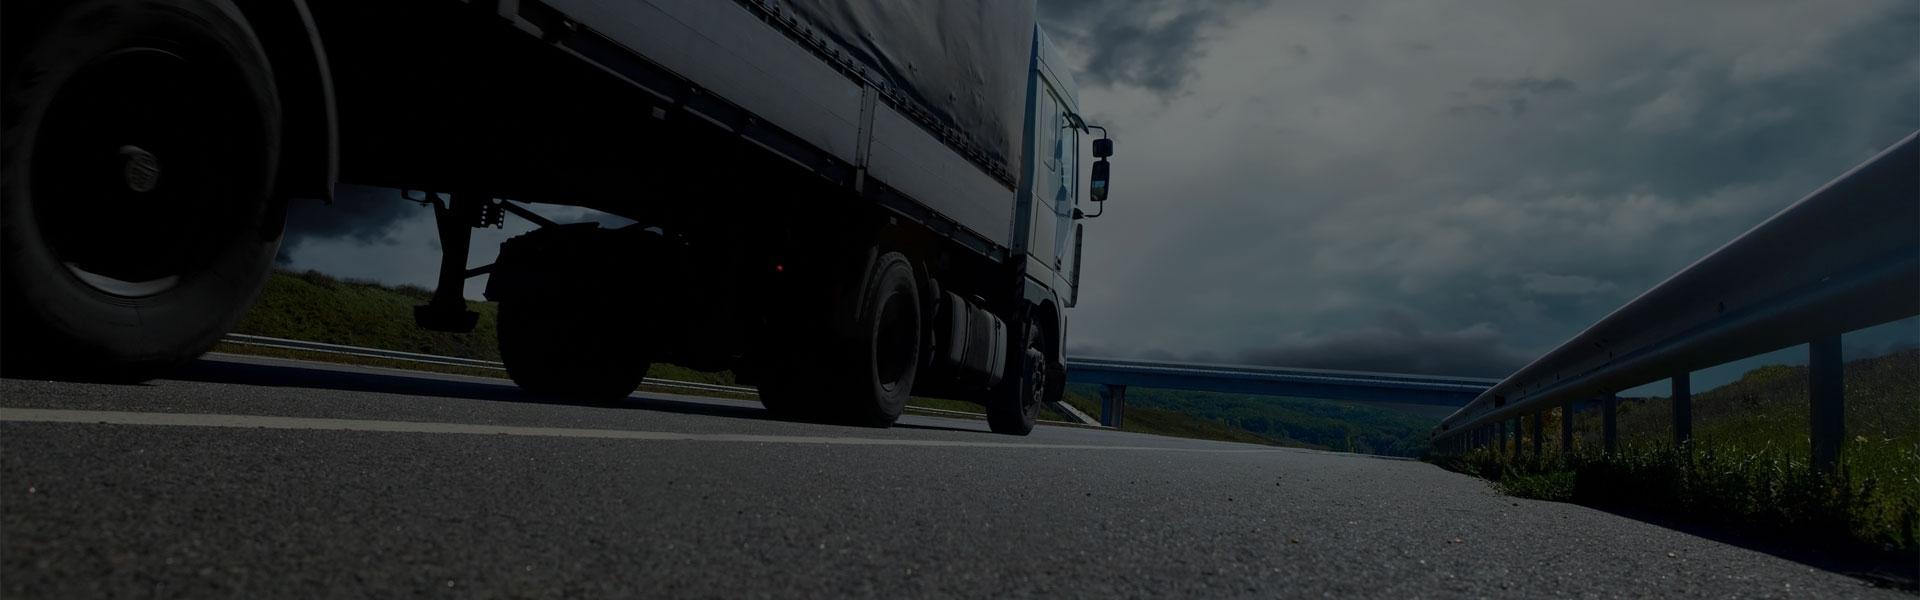 Saveon Logistics (@saveonlogistics) Cover Image